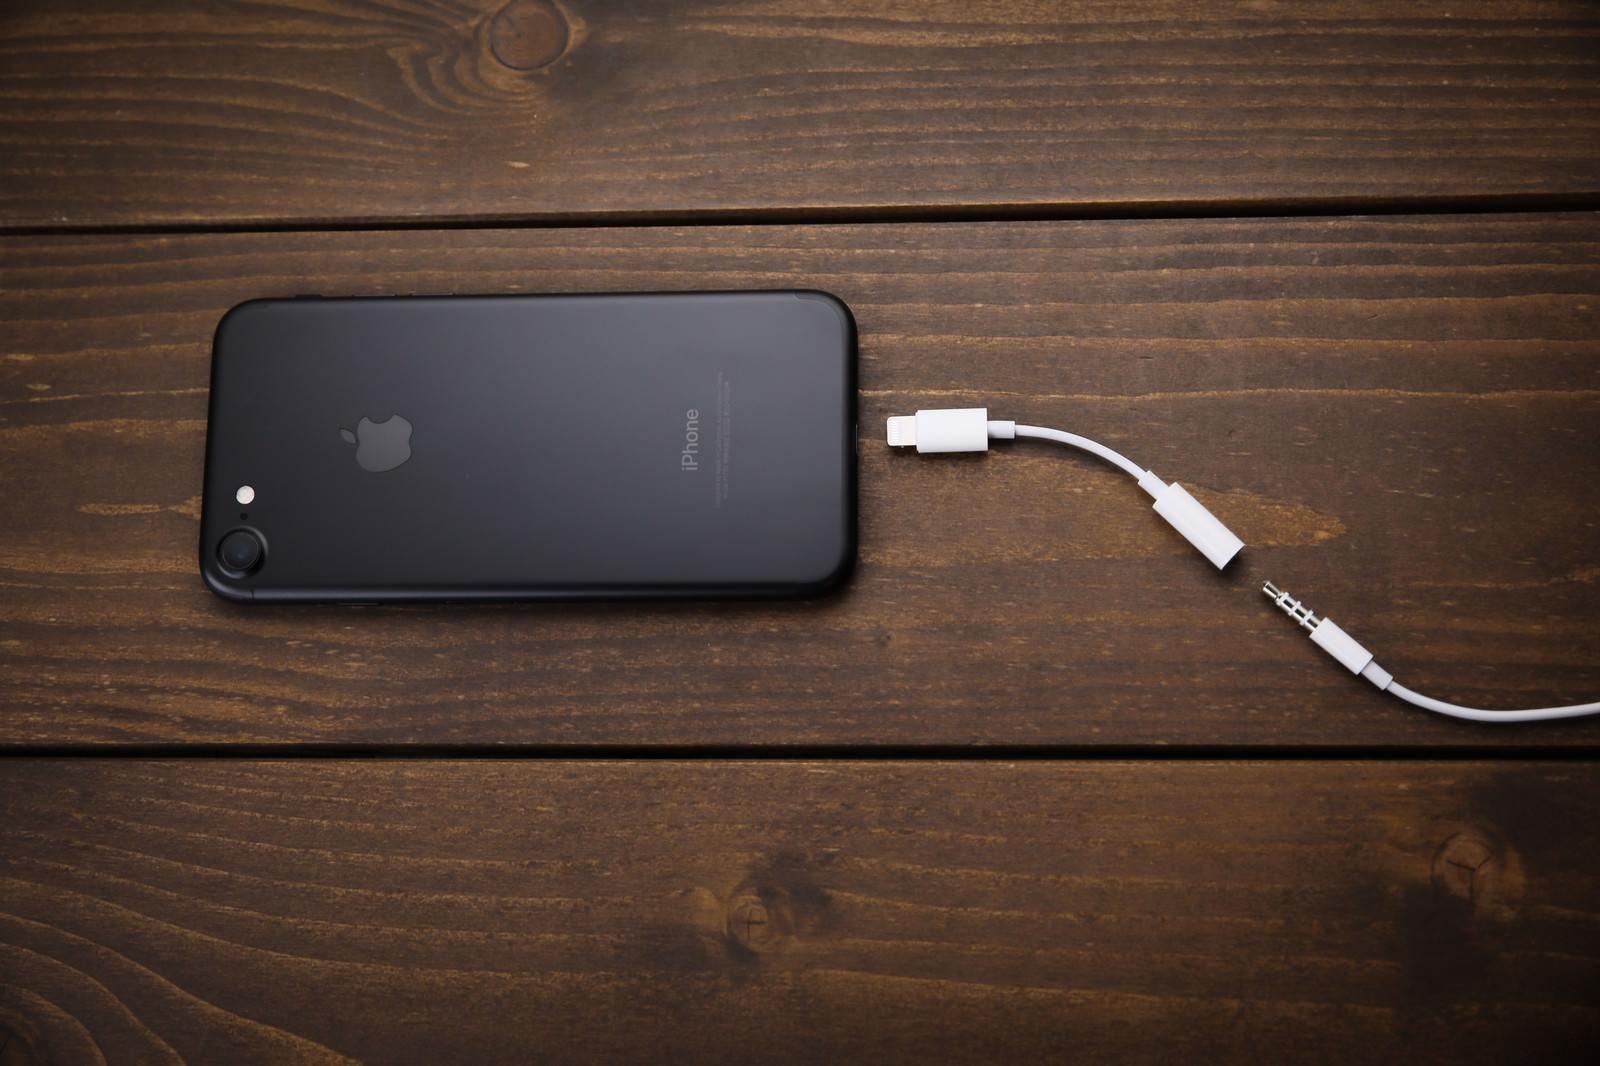 「3.5mmヘッドフォン端子が廃止され変換器を使用する」の写真